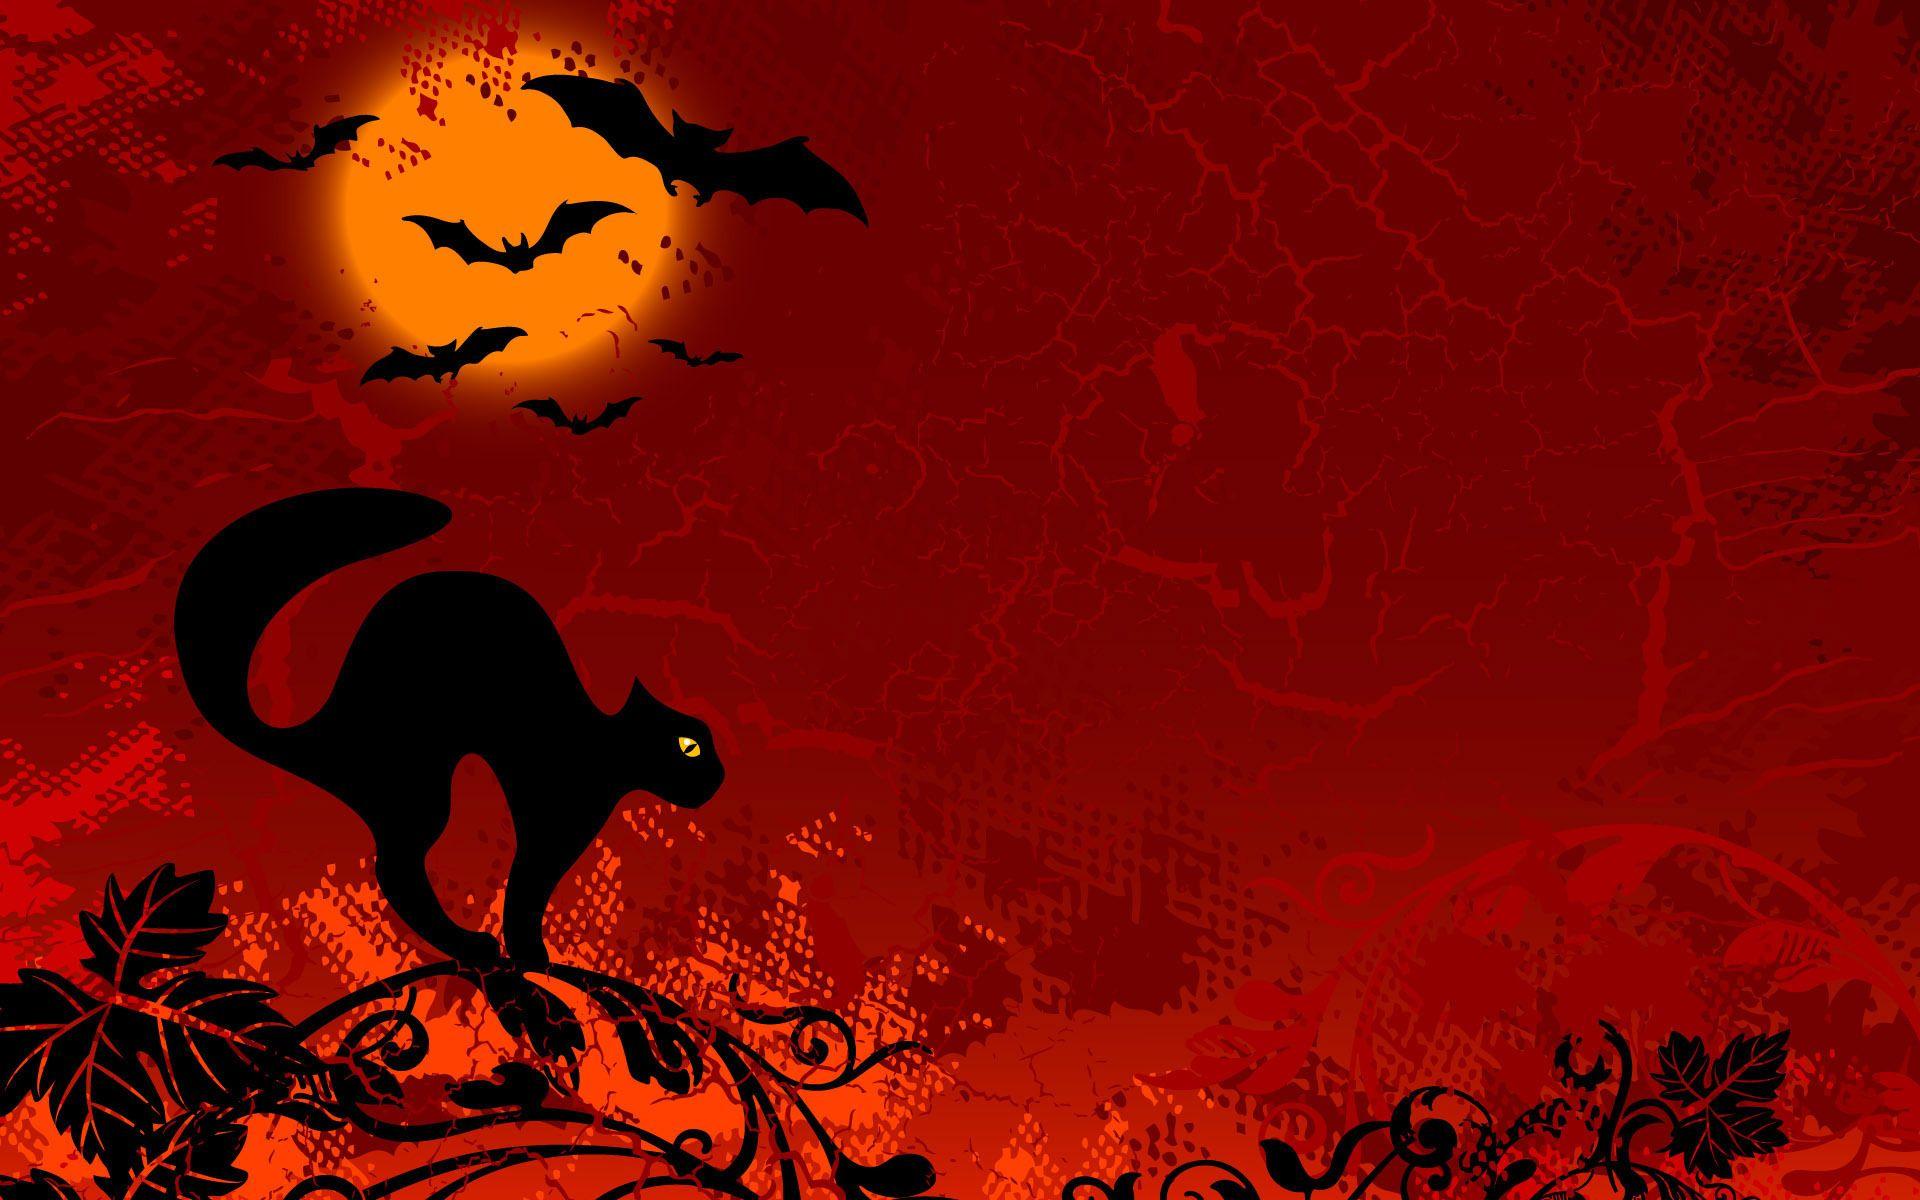 K5LQGM4 Halloween Wallpapers For Desktop 1024x784 px 1920x1200